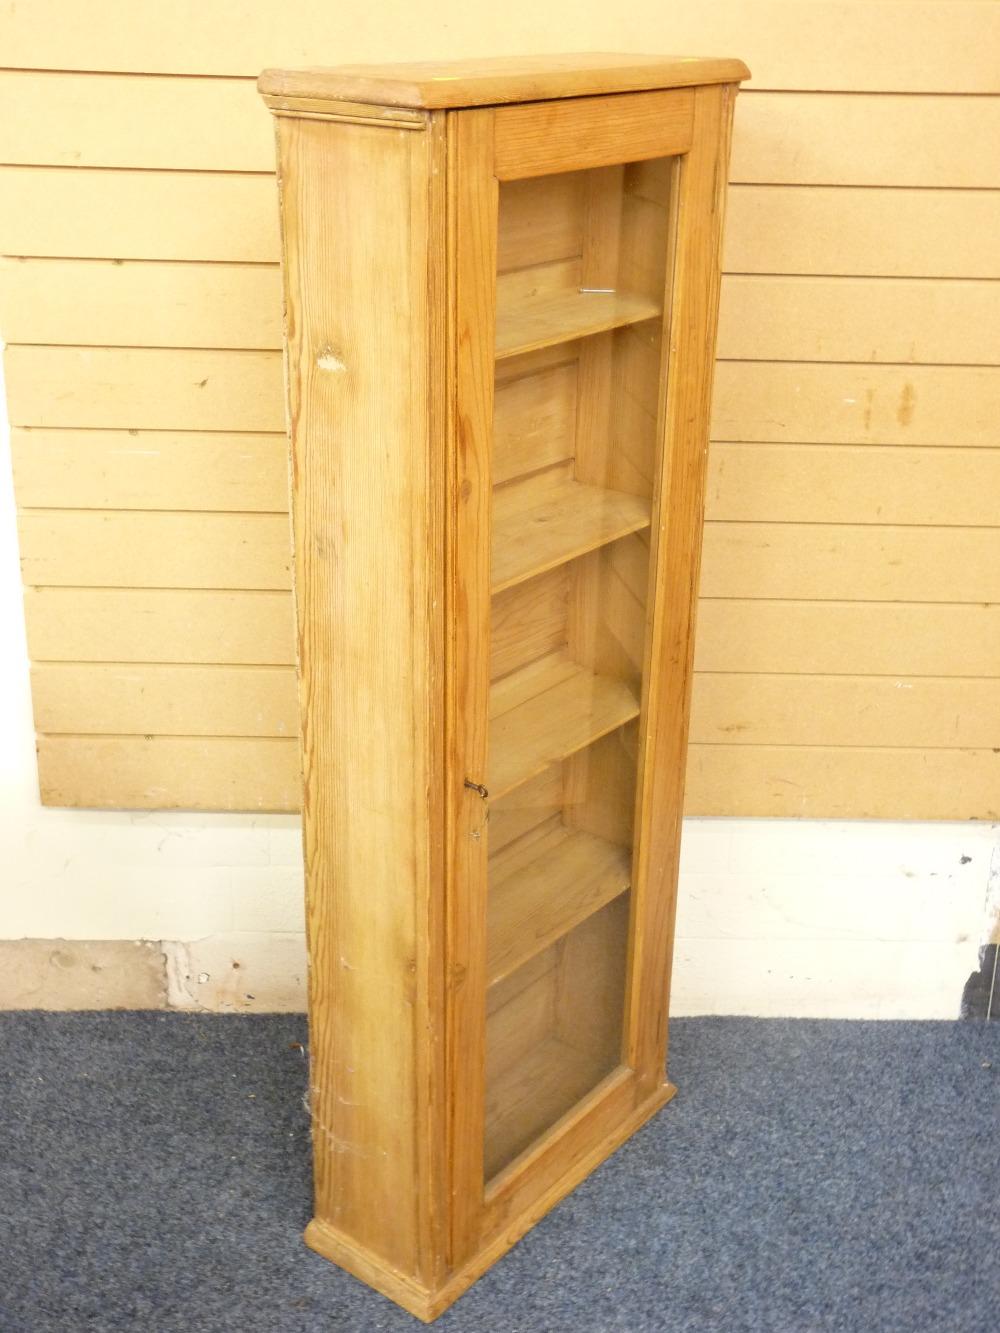 Lot 51 - SLIM PINE DISPLAY/BOOK-CASE CABINET, 129cms height, 51cms width, 20cms depth